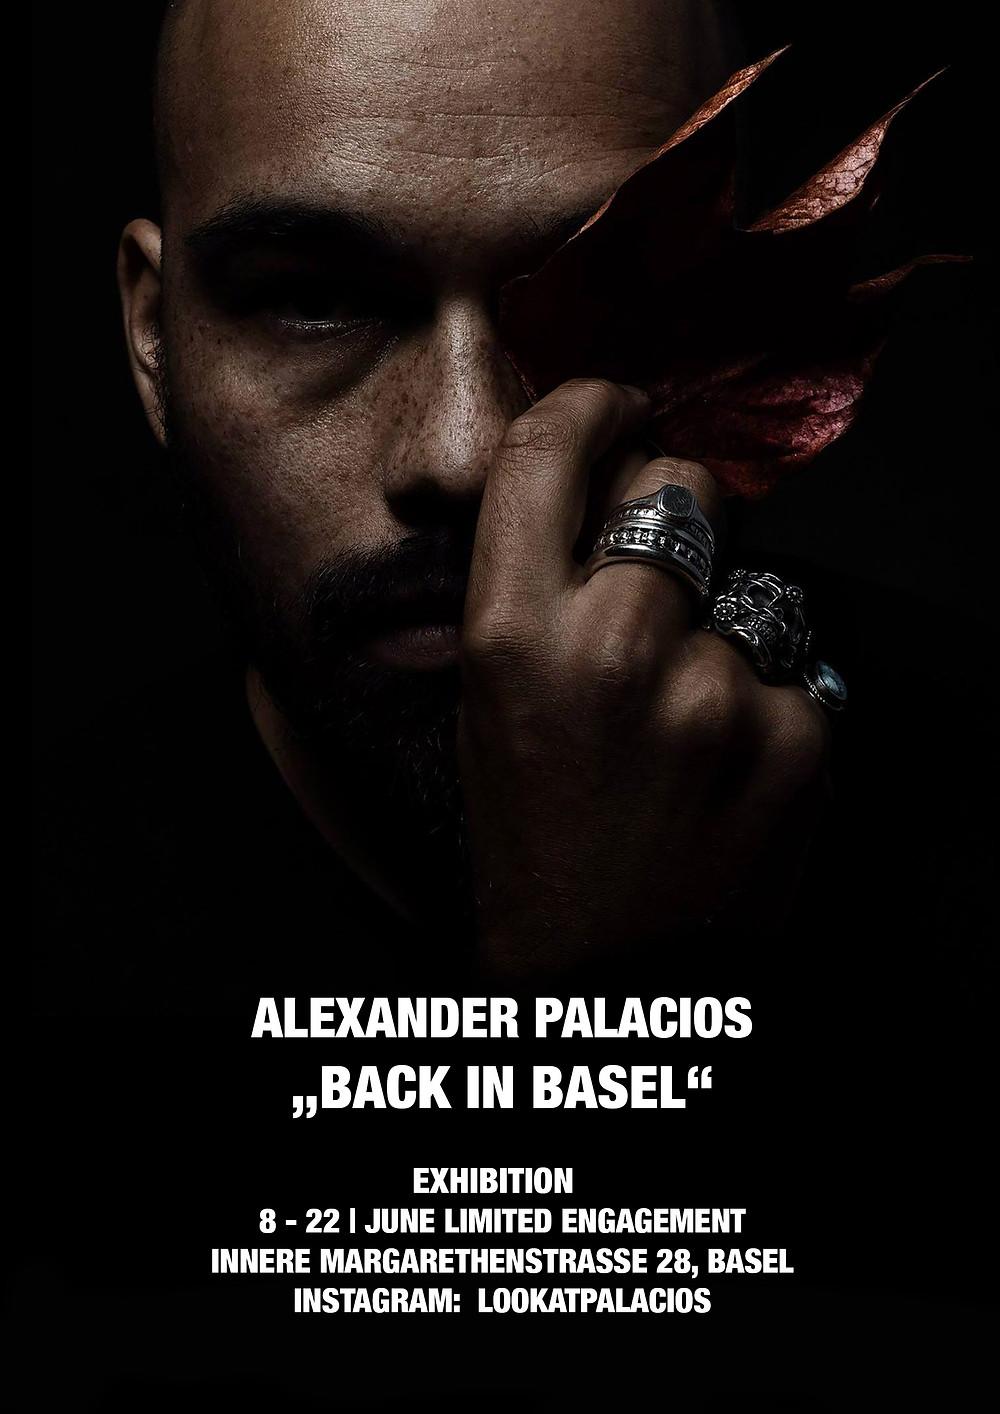 Back in Basel Alexander Palacios